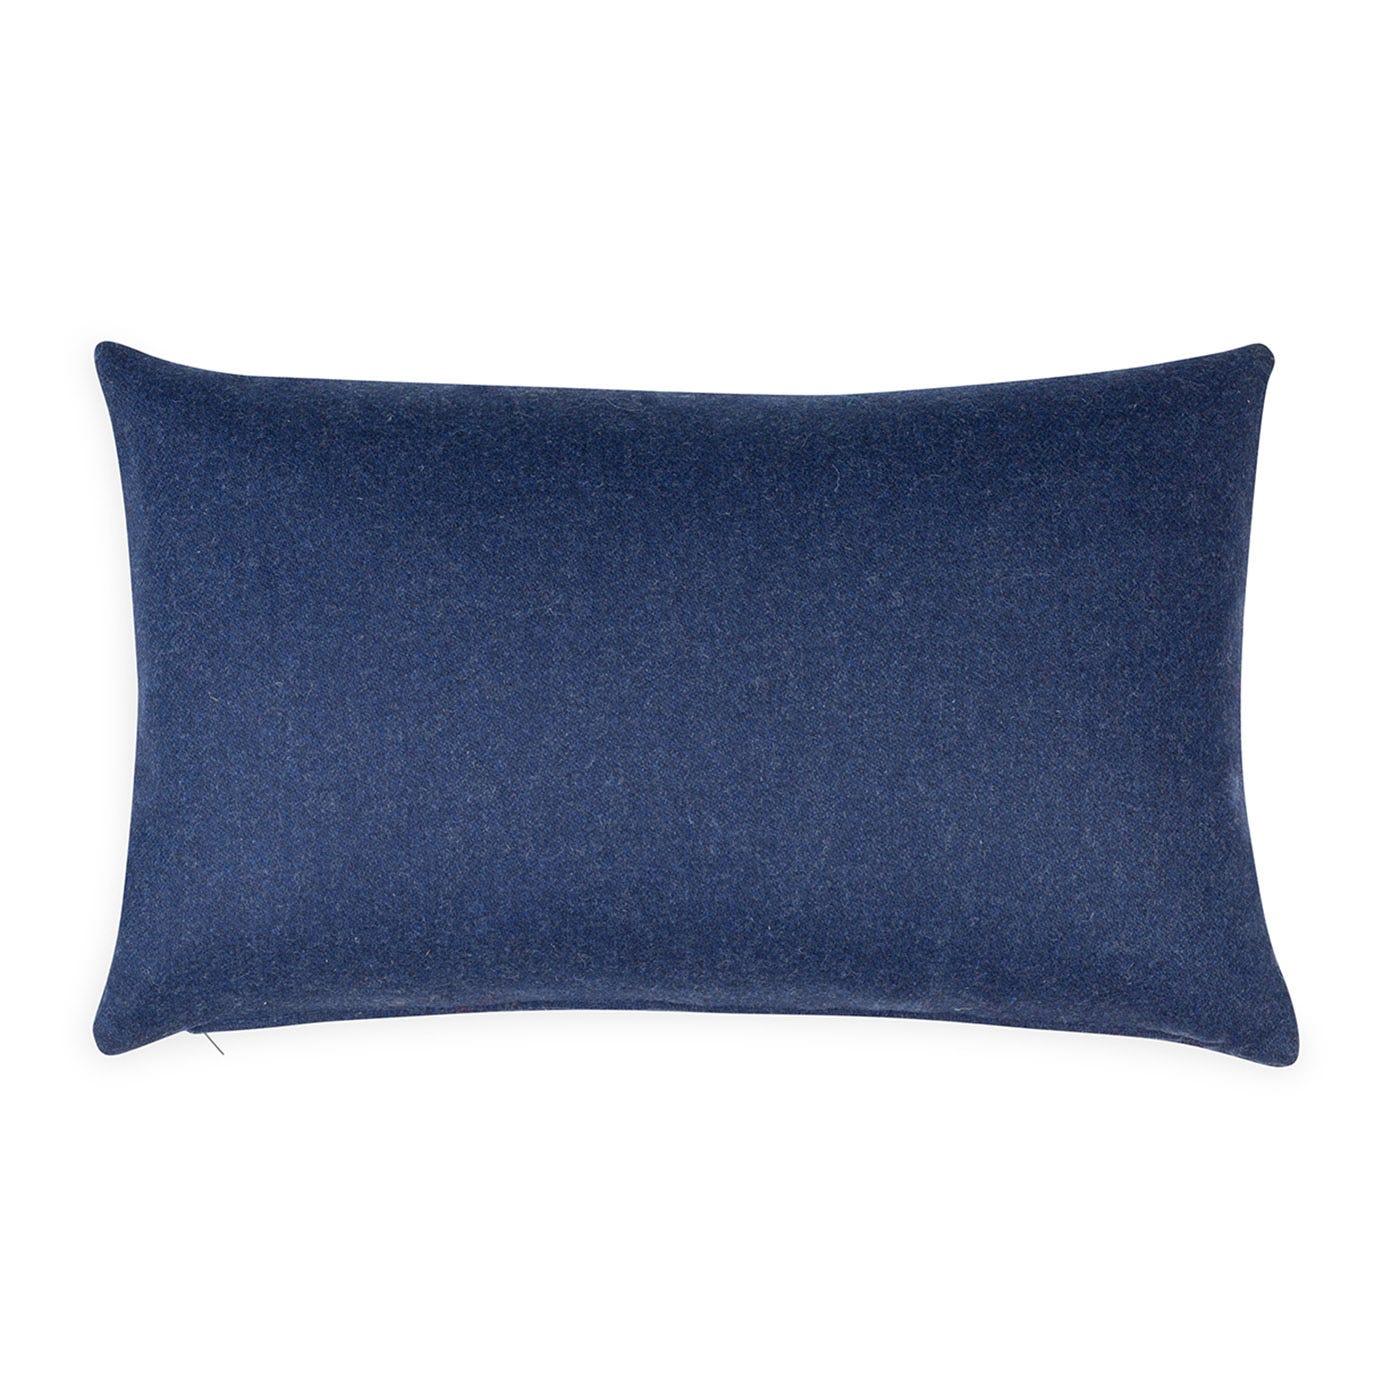 Islington Wool Cushion Navy 35 x 55cm